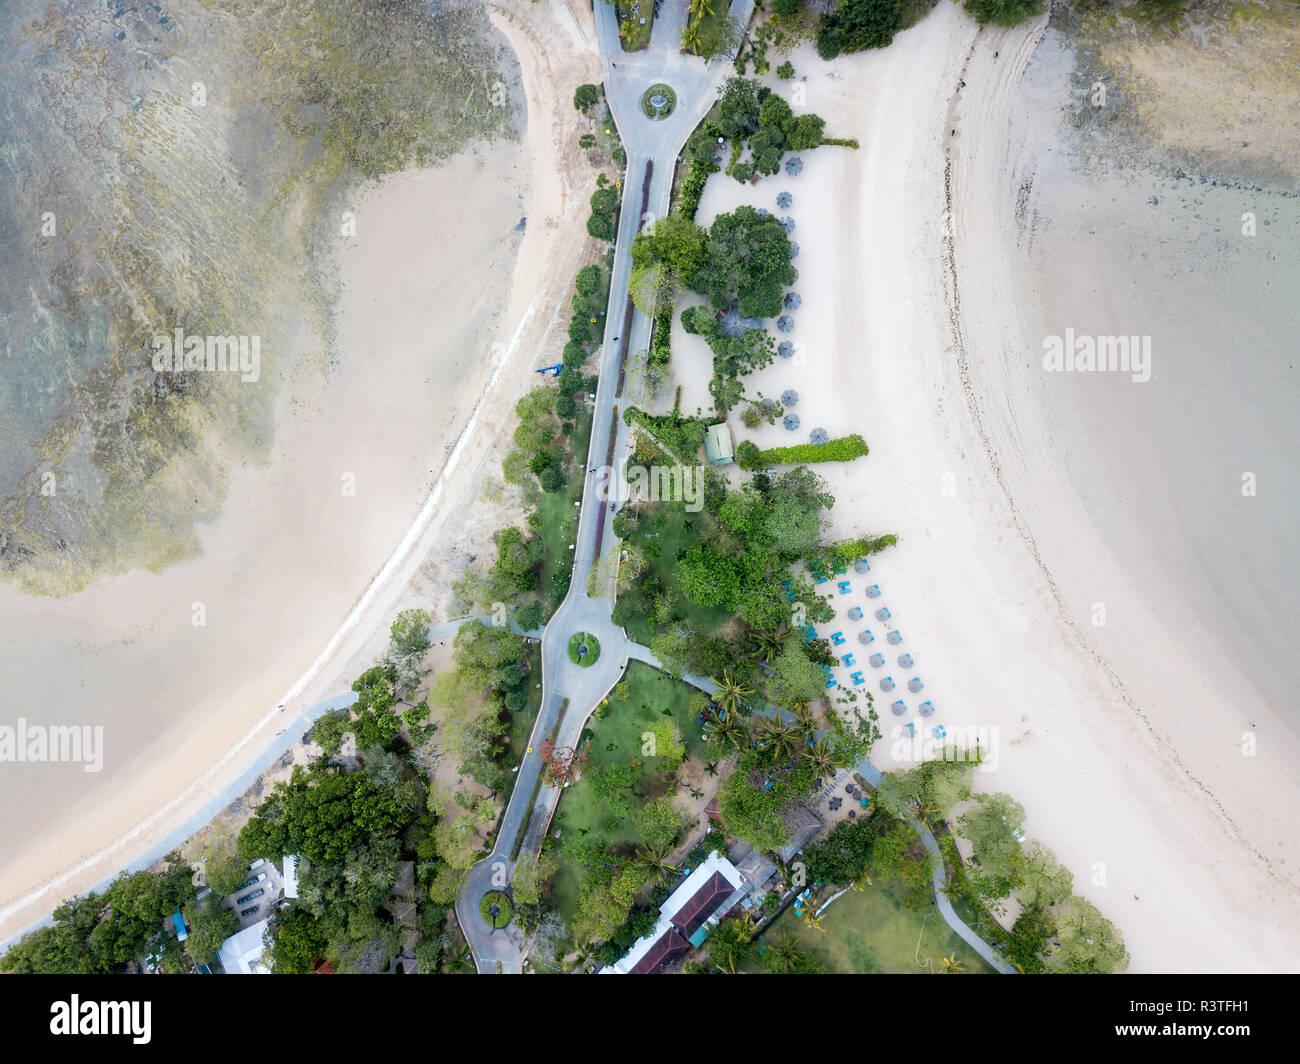 Indonesia, Bali, Aerial view of Nusa Dua beach, road - Stock Image